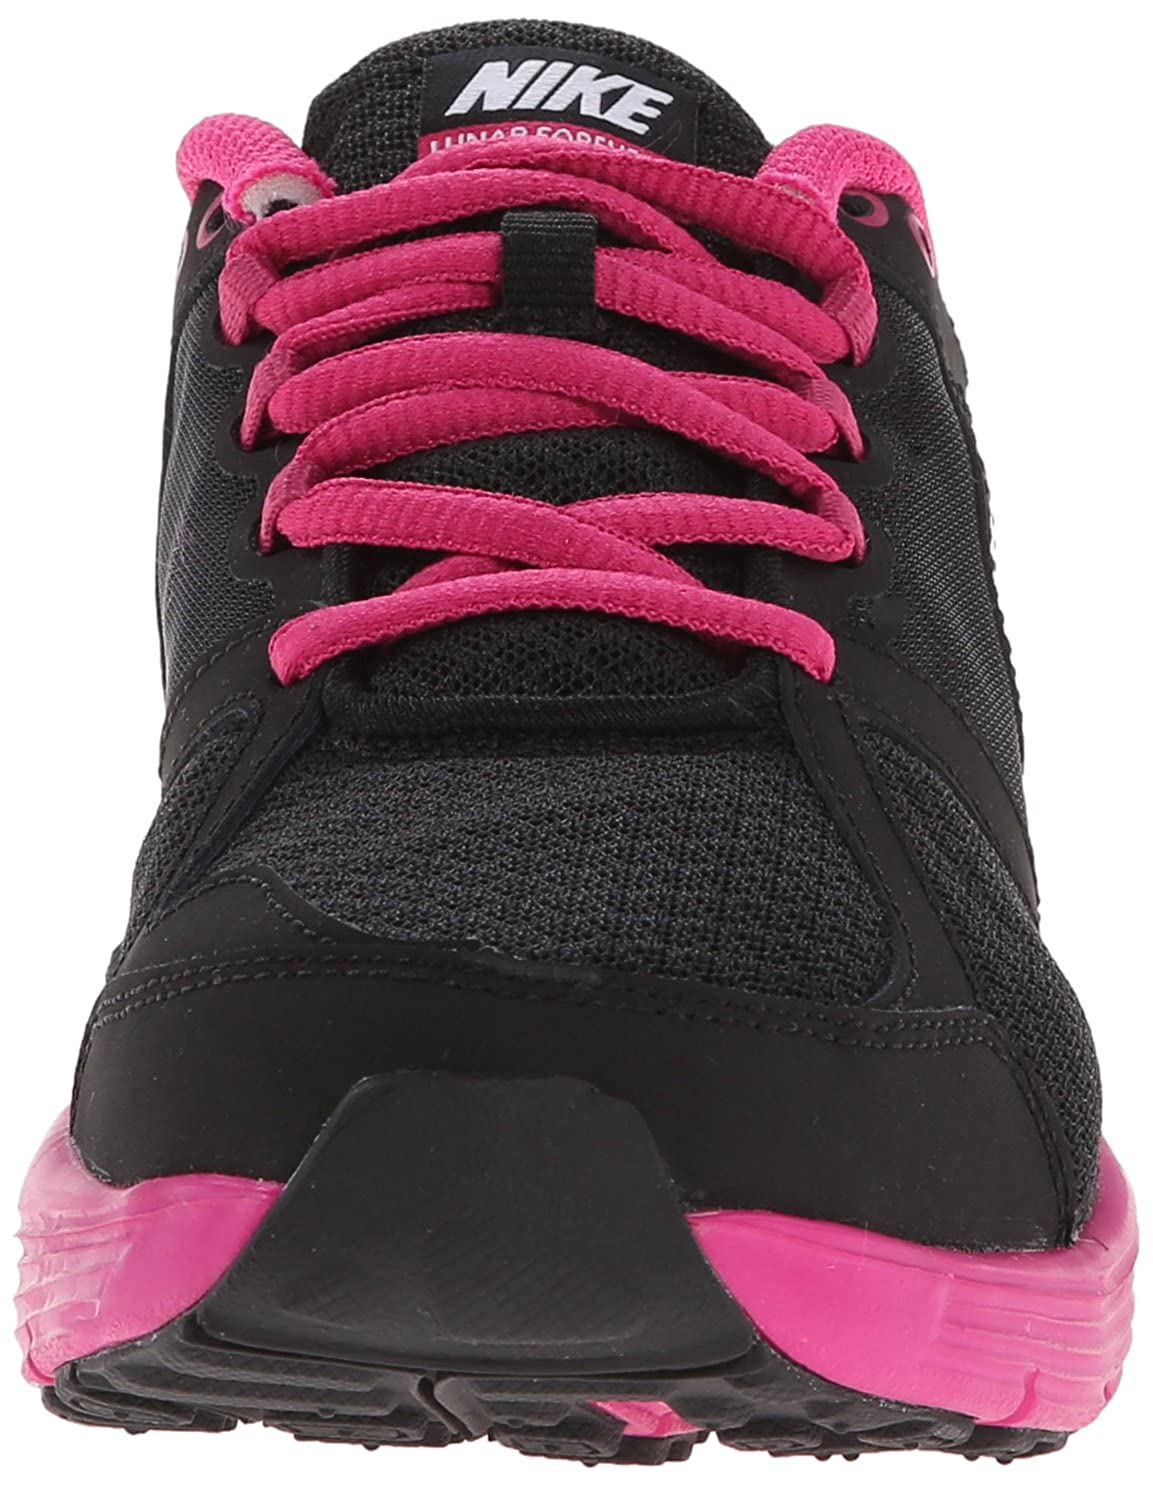 cda46018dc9 Nike Free 5.0 642198 Unisex Laufschuhe  Nike  Amazon.de  Schuhe    Handtaschen